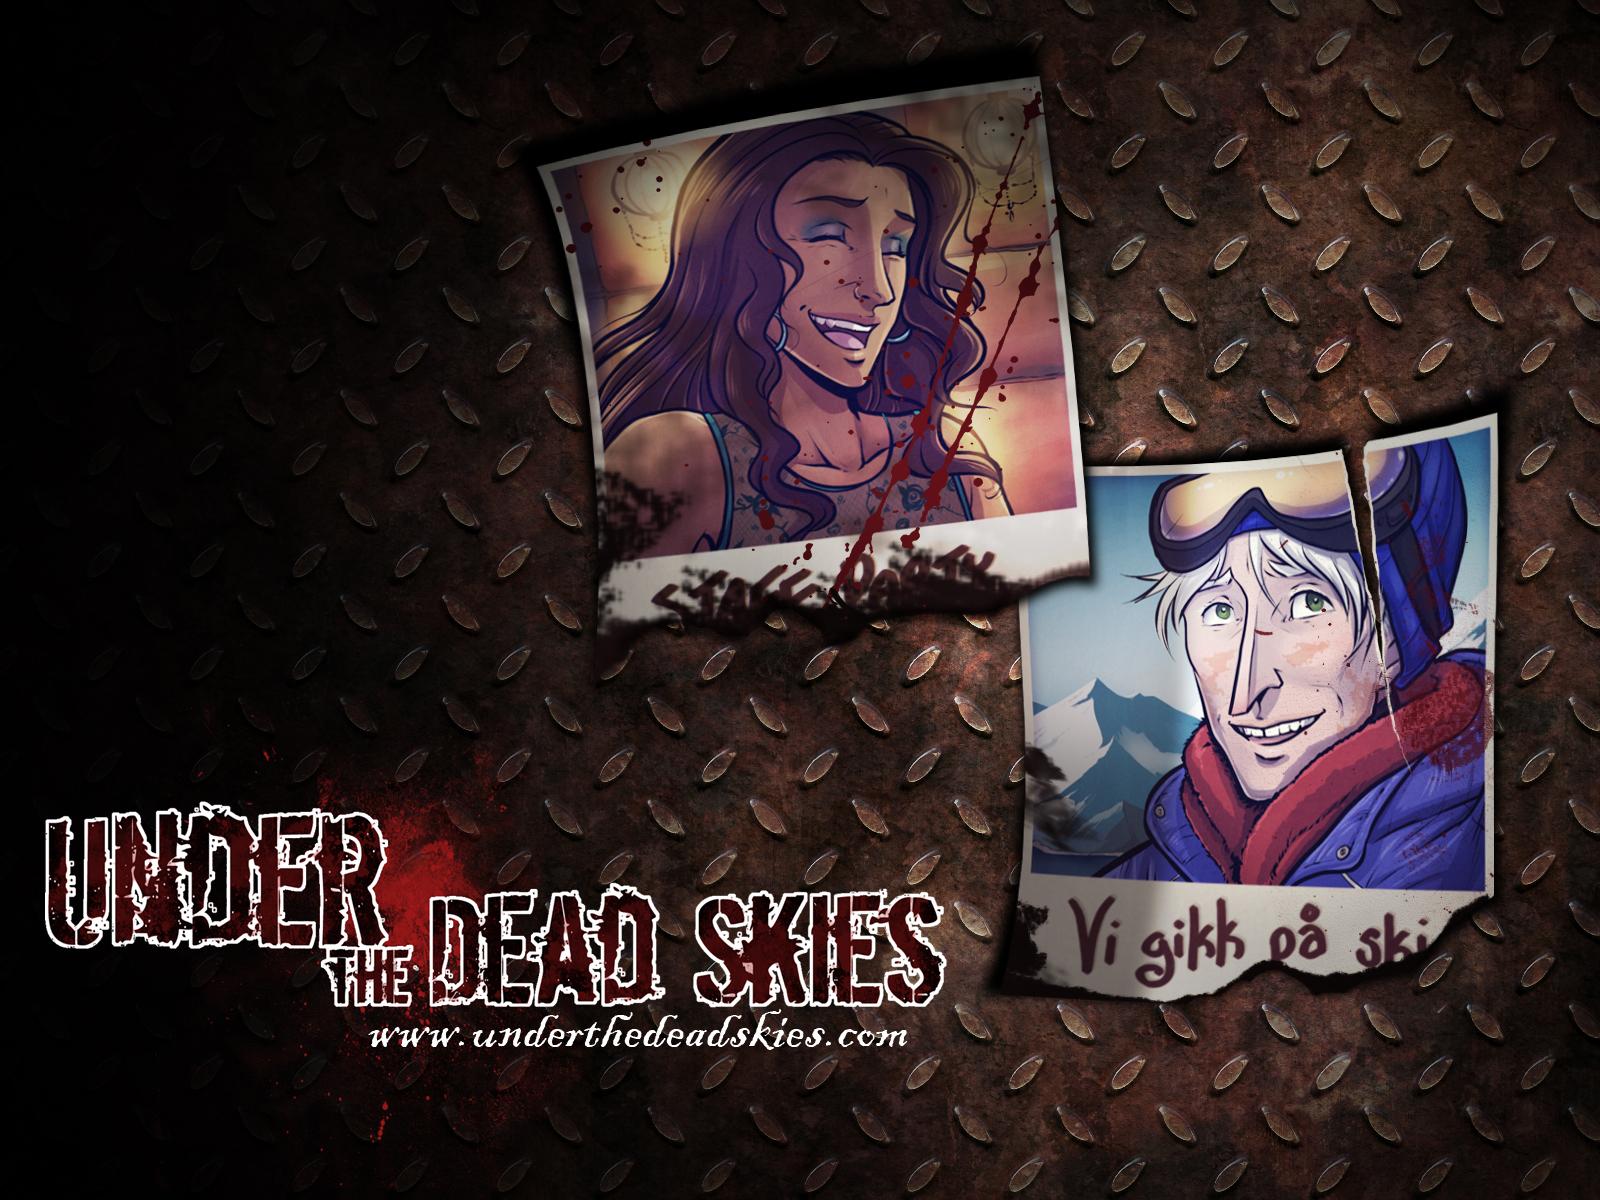 Under the Dead Skies - Polaroid Wallpaper by lunajile